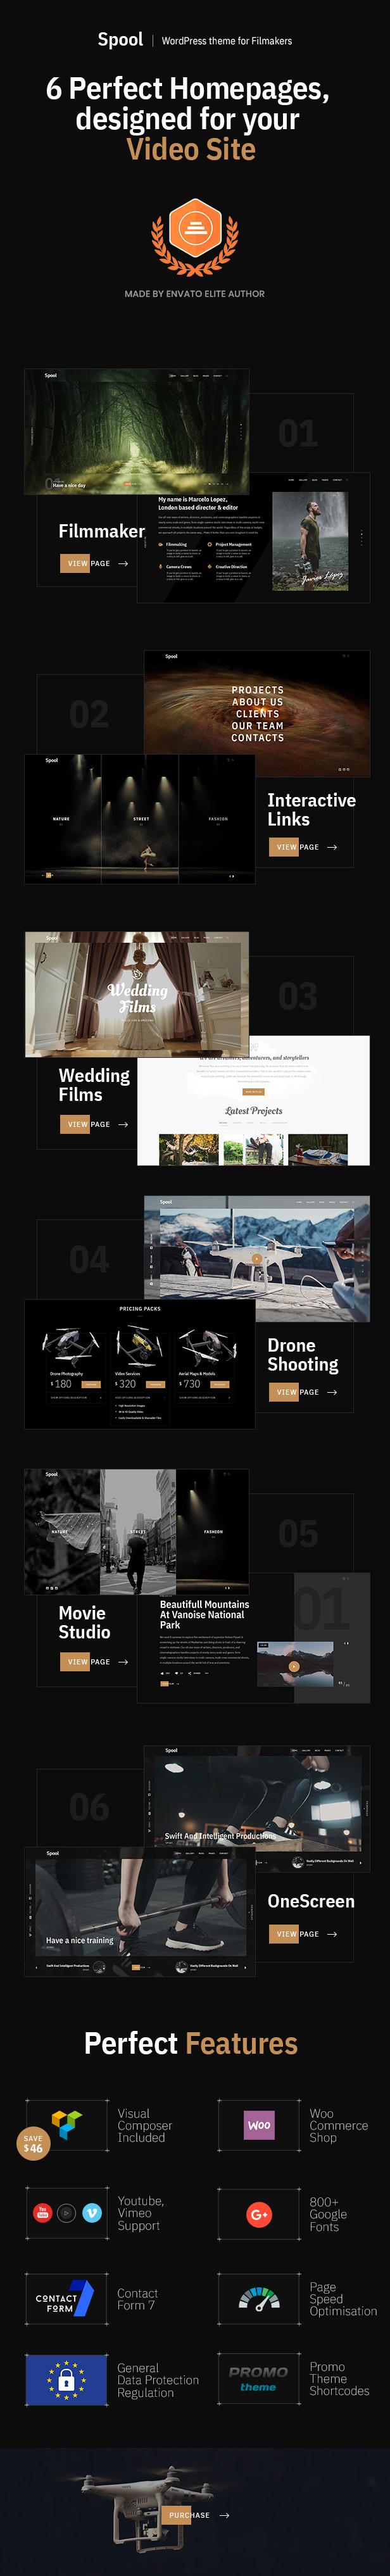 Spool - Movie Studios and Filmmakers WordPress Theme - 4